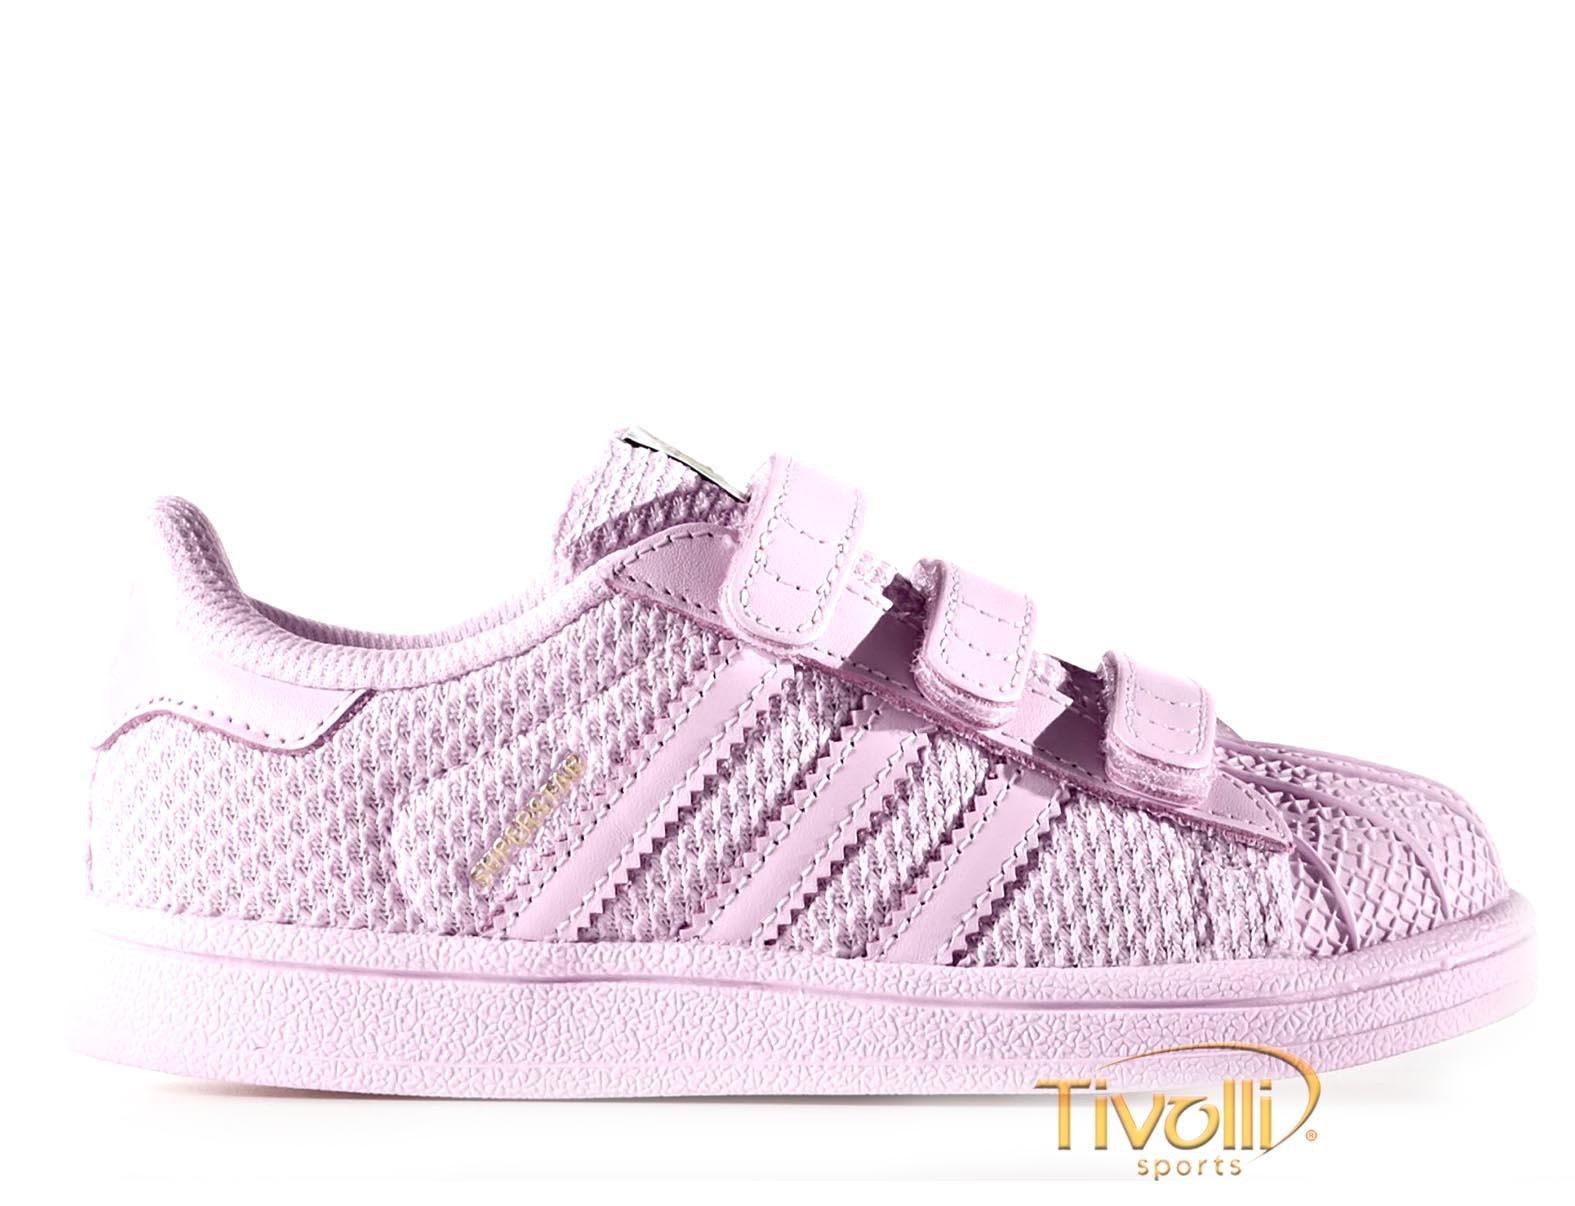 3b70137f92 Tênis Adidas Superstar CF I Infantil Tam 19 Ao 25. Tênis Adidas Infantil  Originals Superstar Cf Bz0416 ...